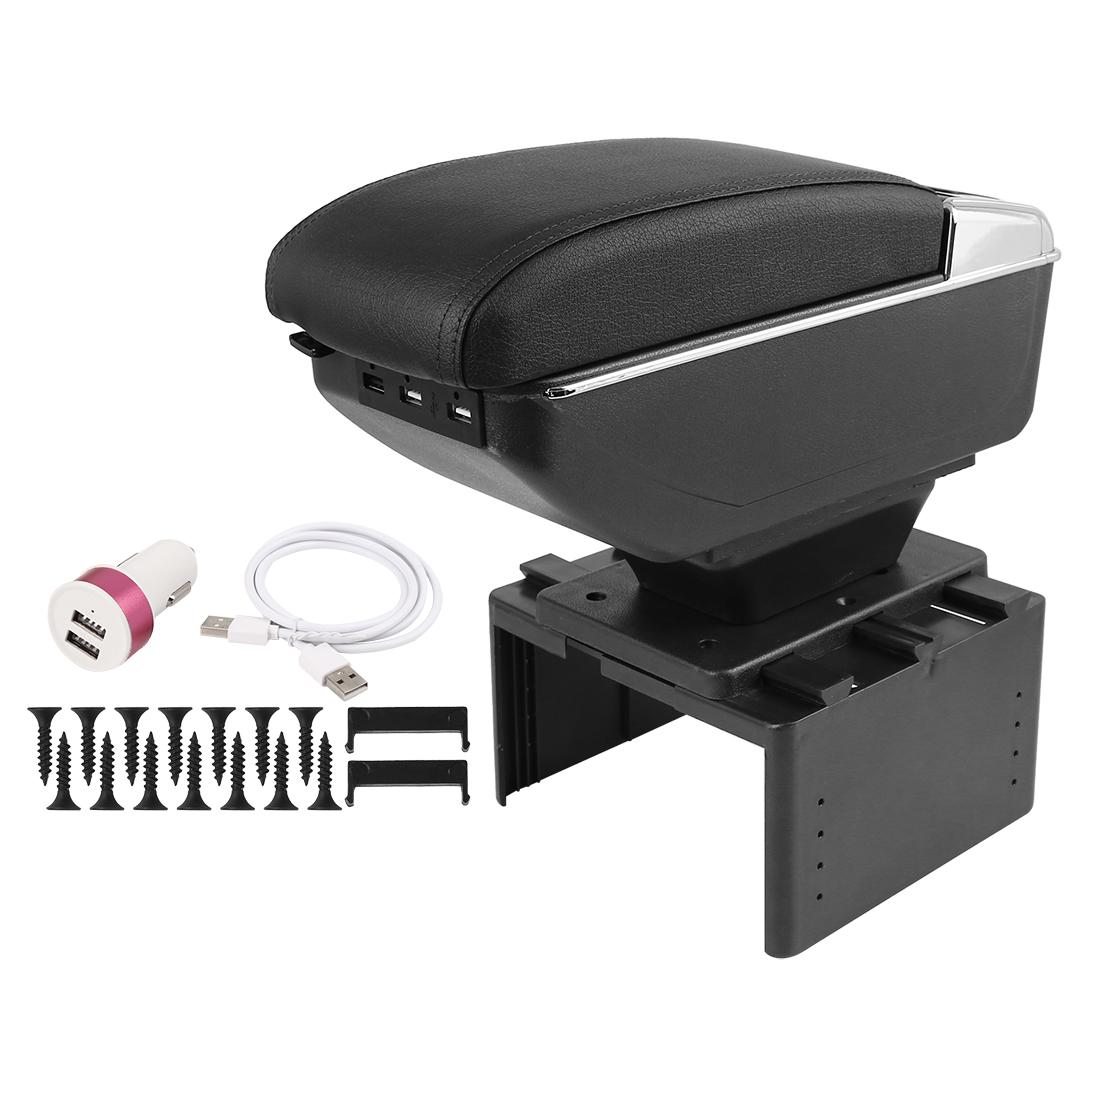 Chargeable Adjustable Single Layer Design Car Central Armrest Box w/ LED 7 USB